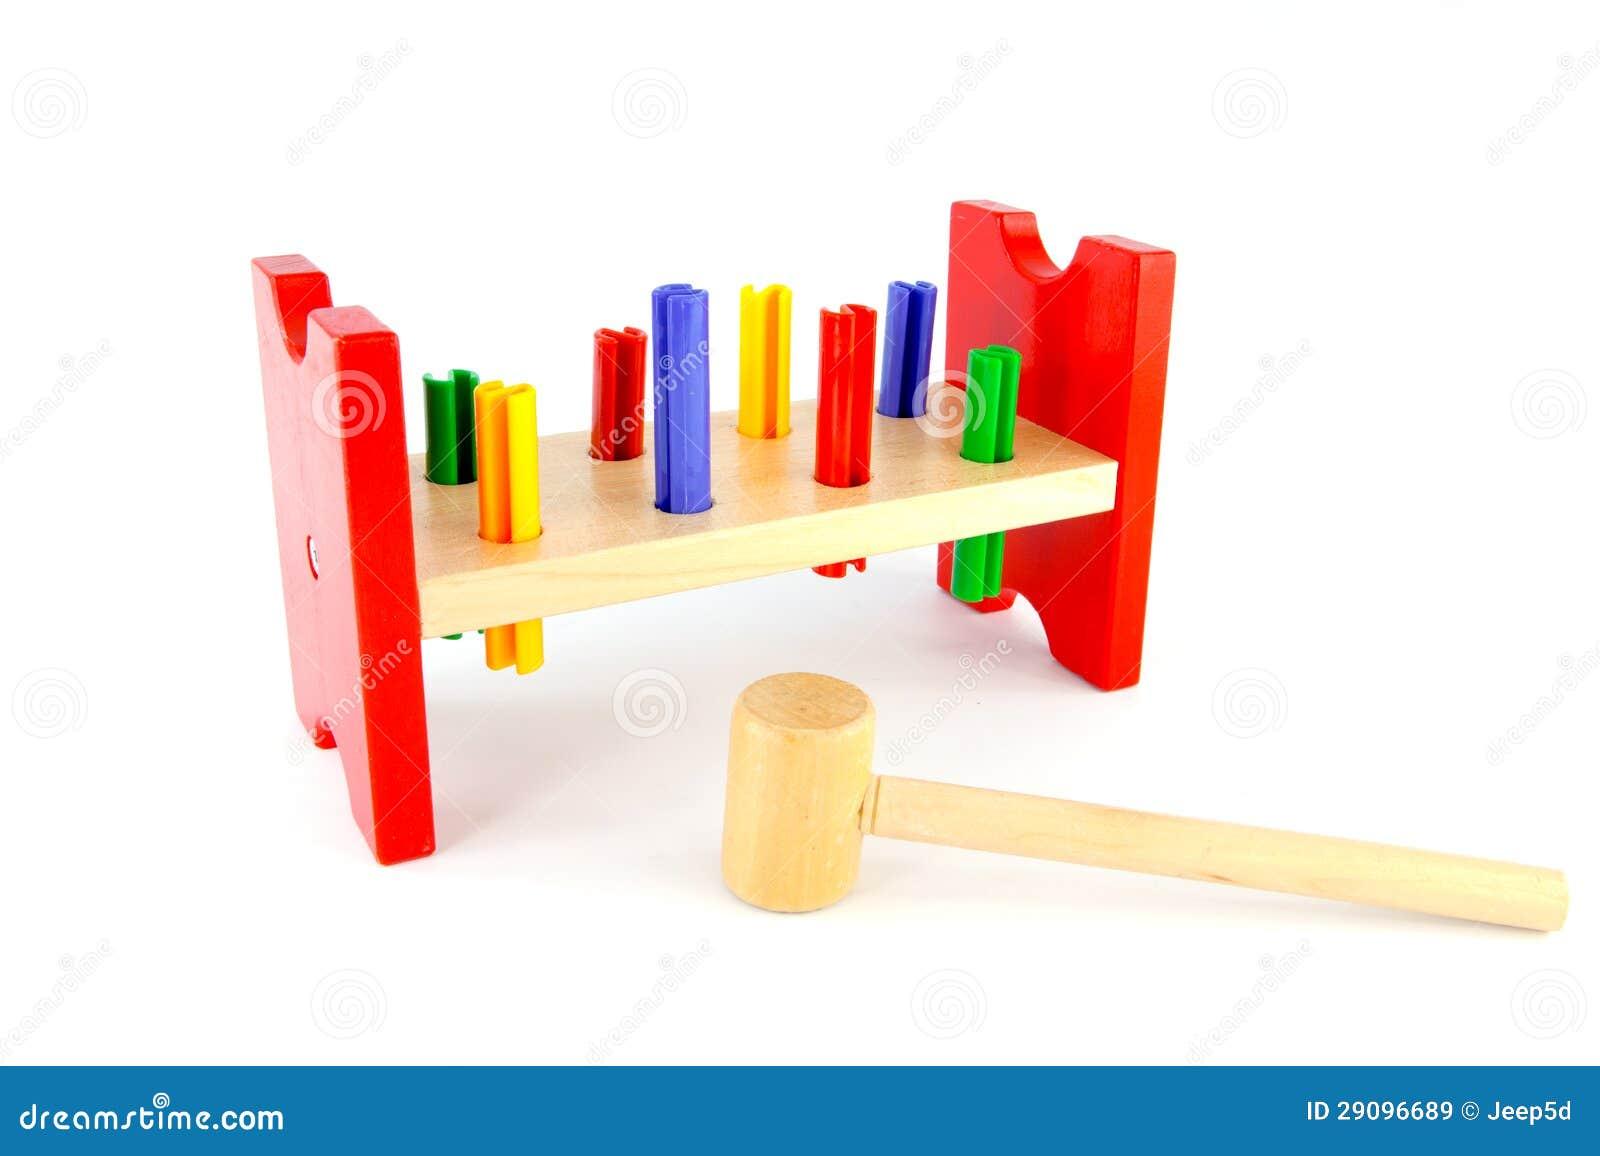 Juguete de madera del martillo im genes de archivo libres - Jugueteros de madera ...